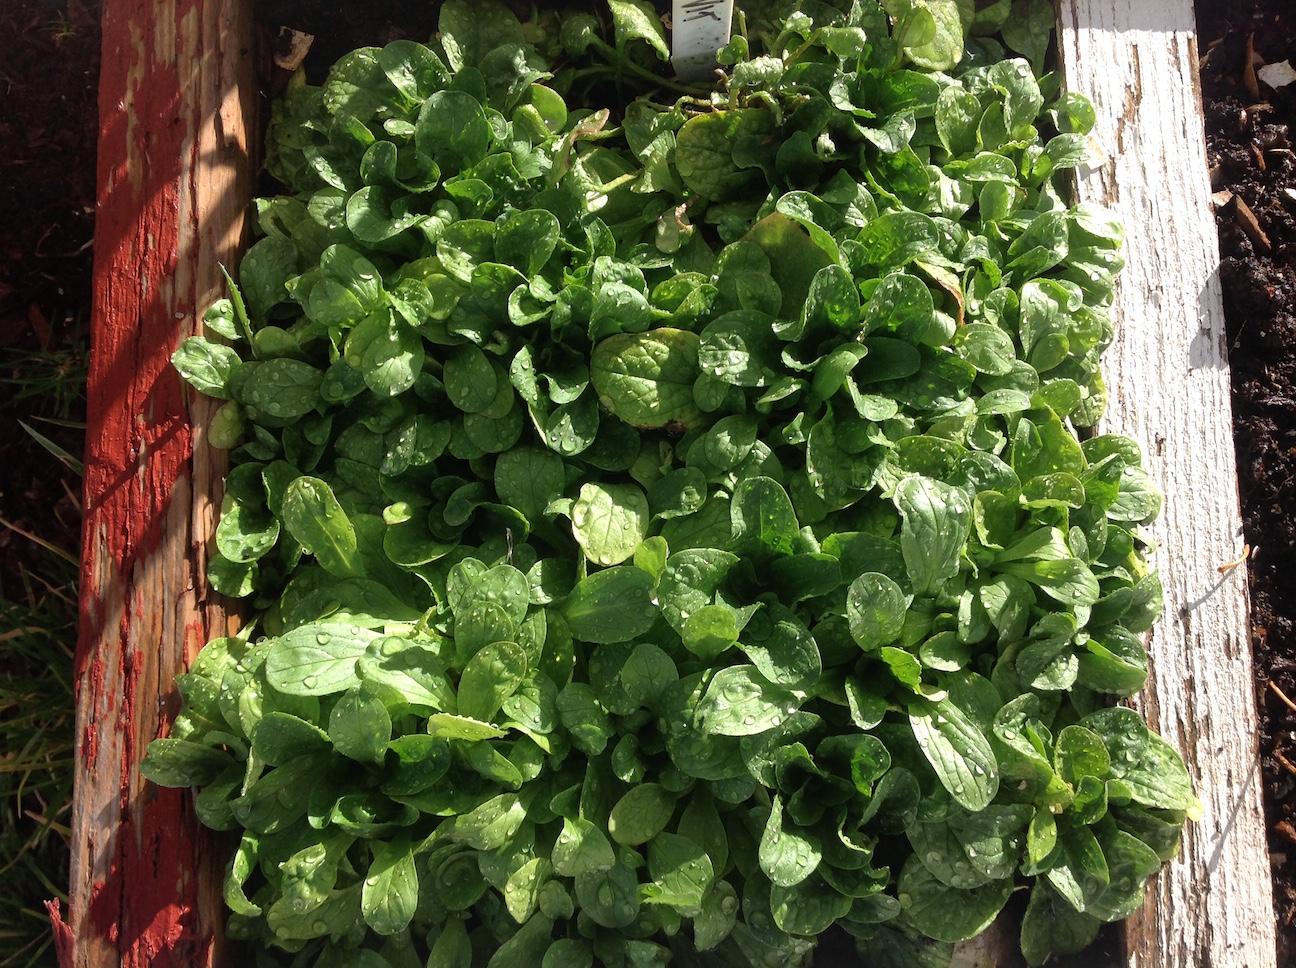 corn salad or mache in square foot gardening